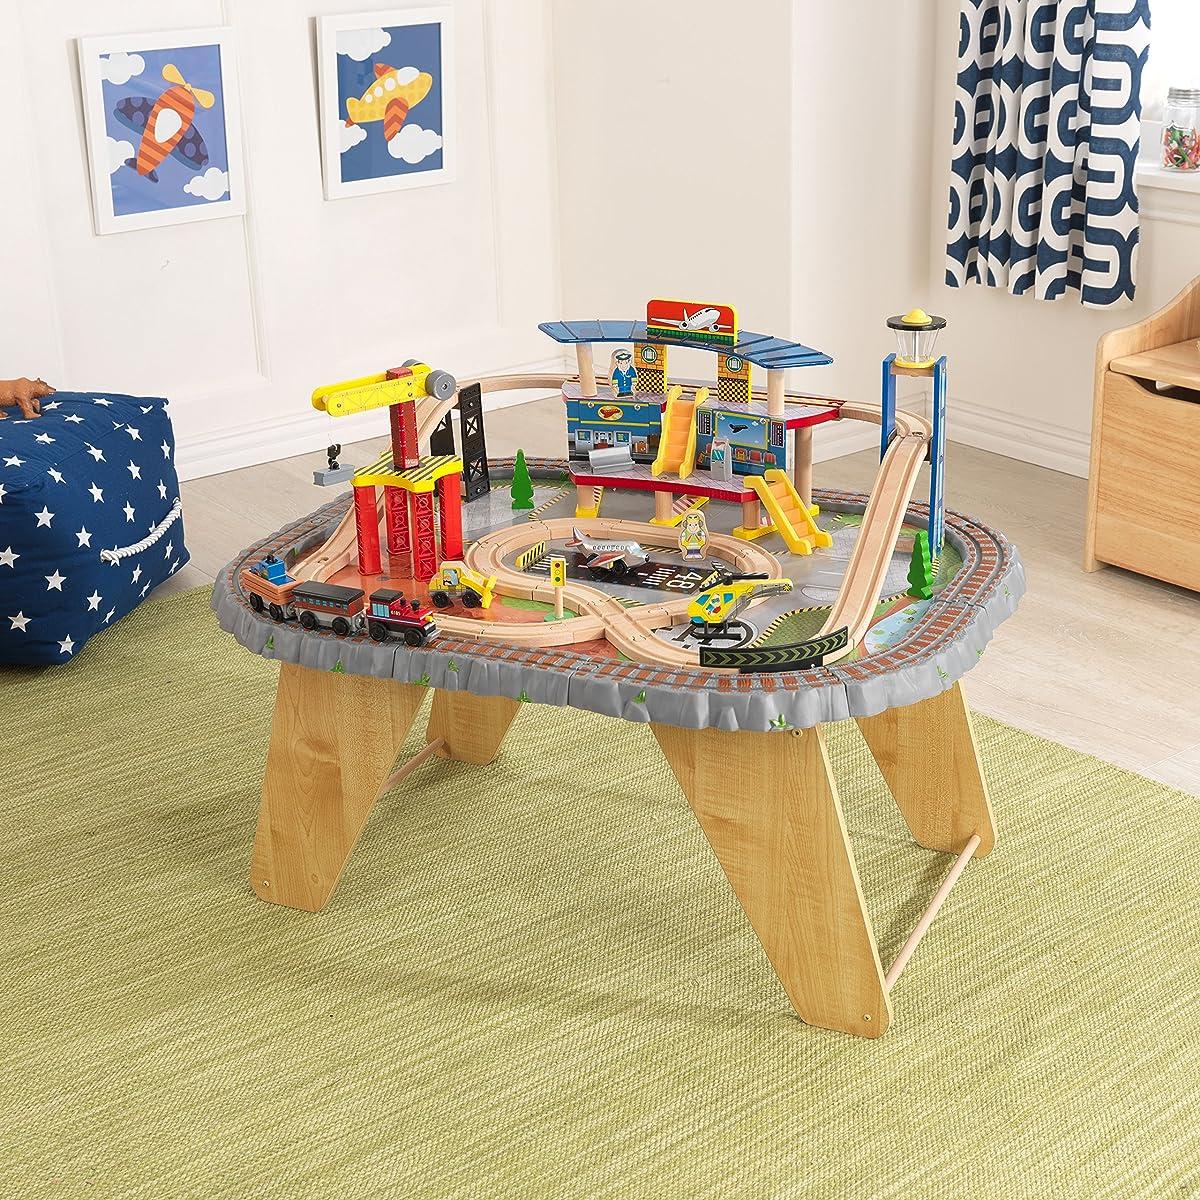 KidKraft 17564.0 Transportation Station Train Set and Table Toy